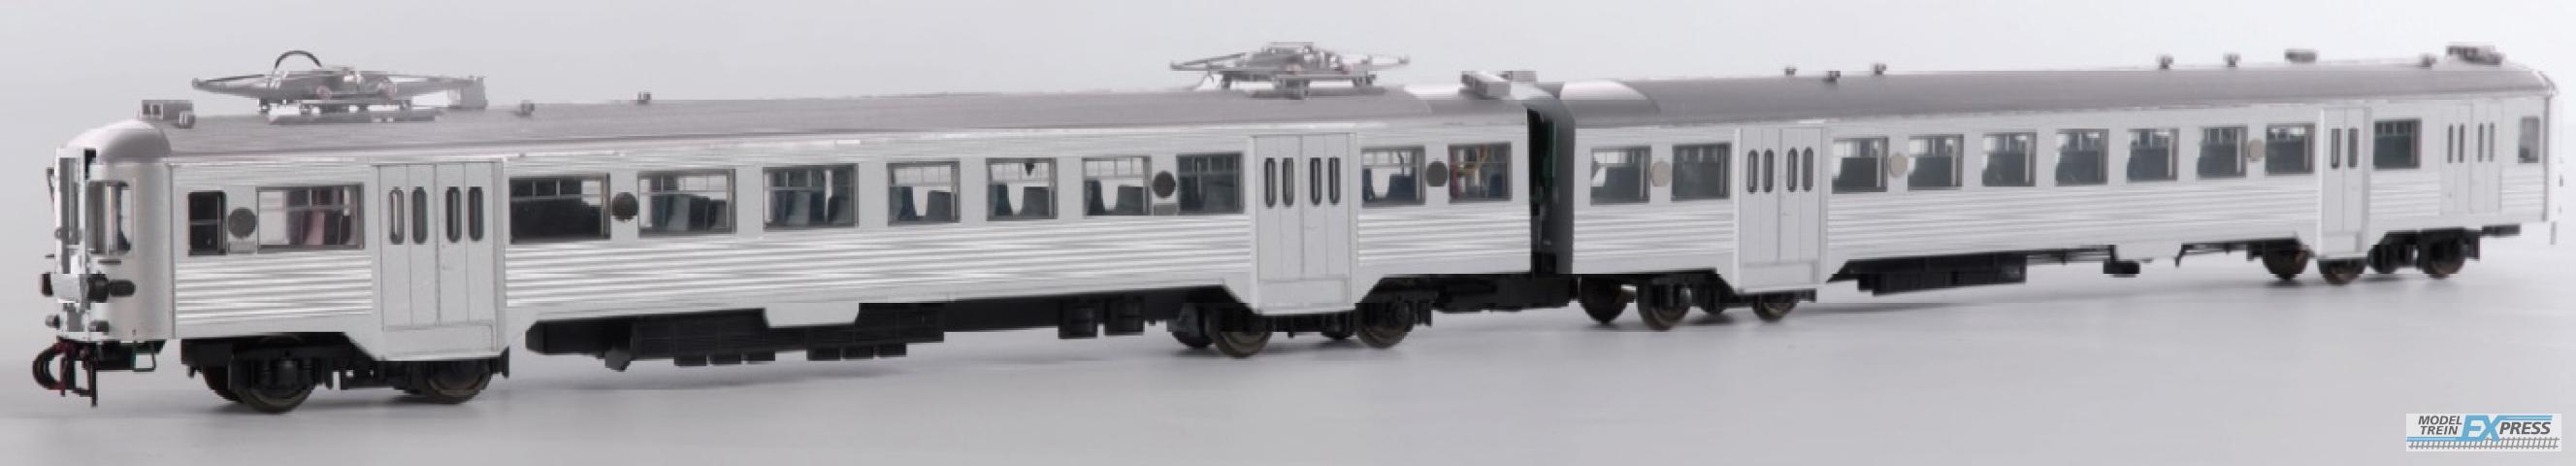 B-Models 7101.03L